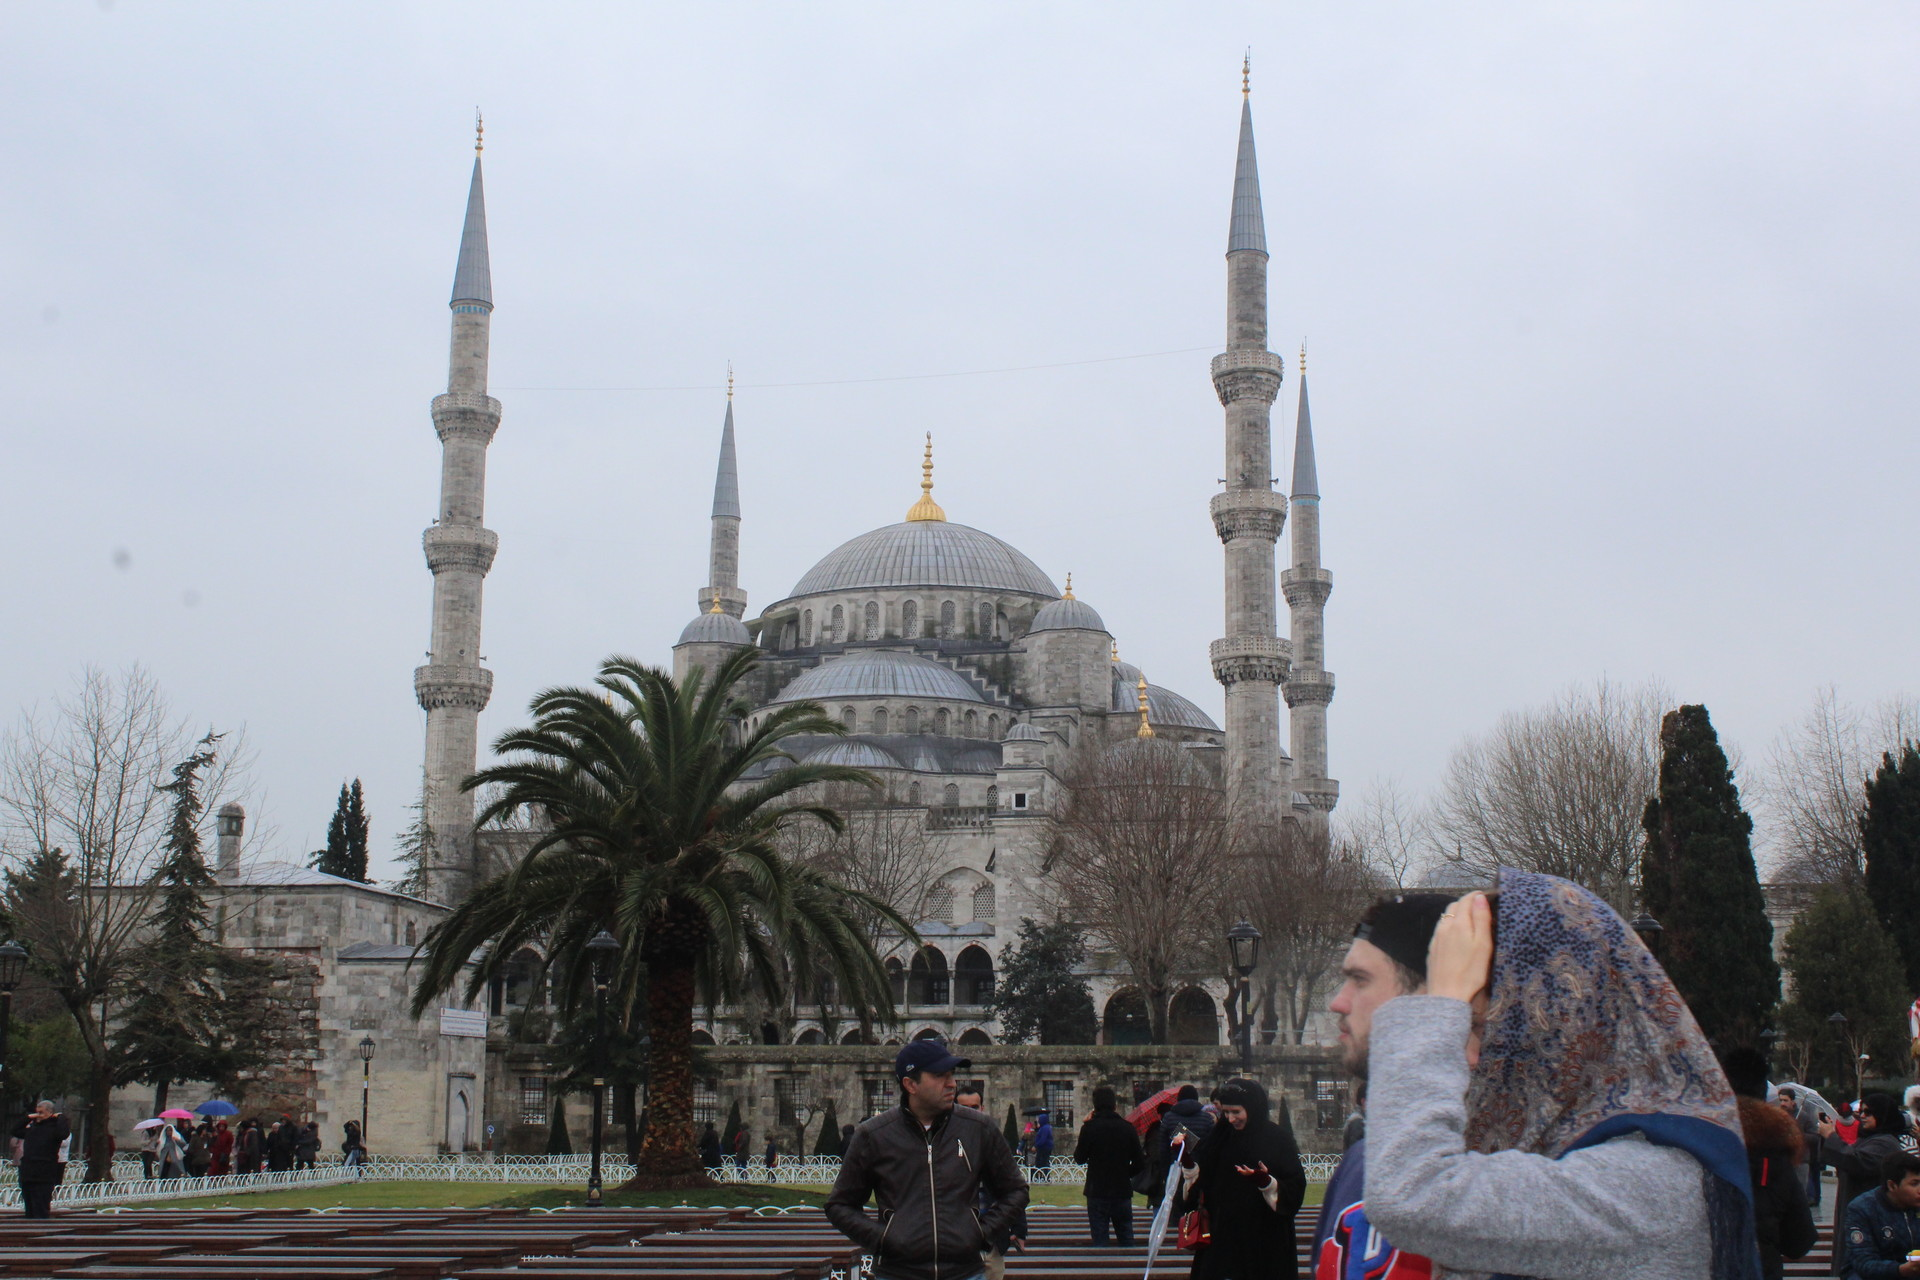 aventura-istambul-2-dia-67ff4ffb9b1e7904